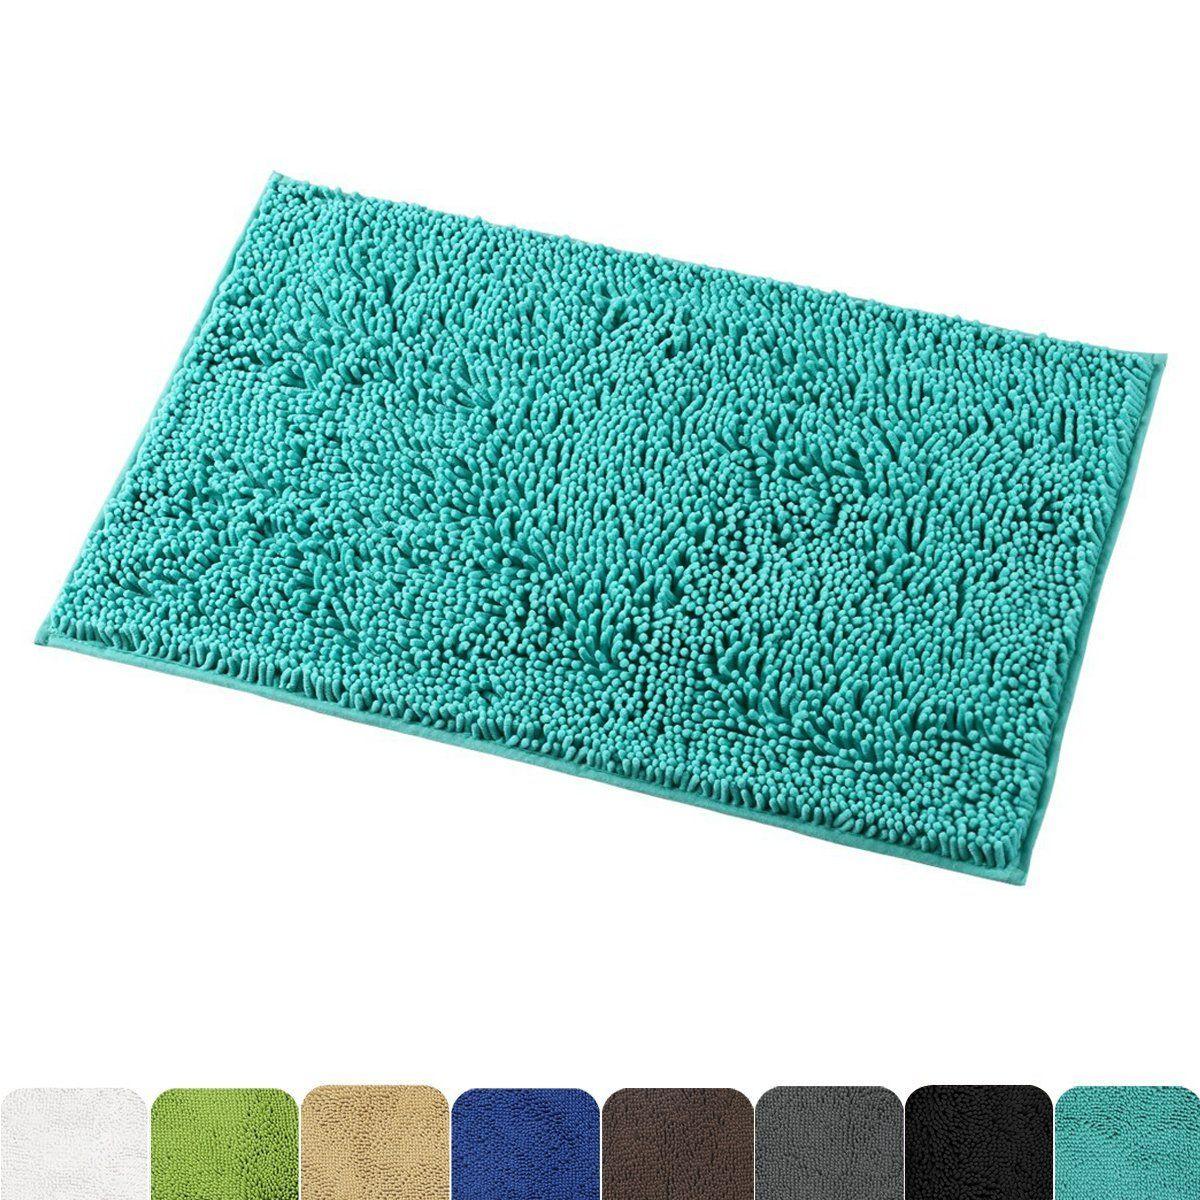 Mayshine Nonslip Bathroom Rug Shag Shower Mat Machinewashable Bath Mats With Water Absorbent Soft Microfibers 20 W X Washable Bath Mat Bathroom Rugs Shower Mat